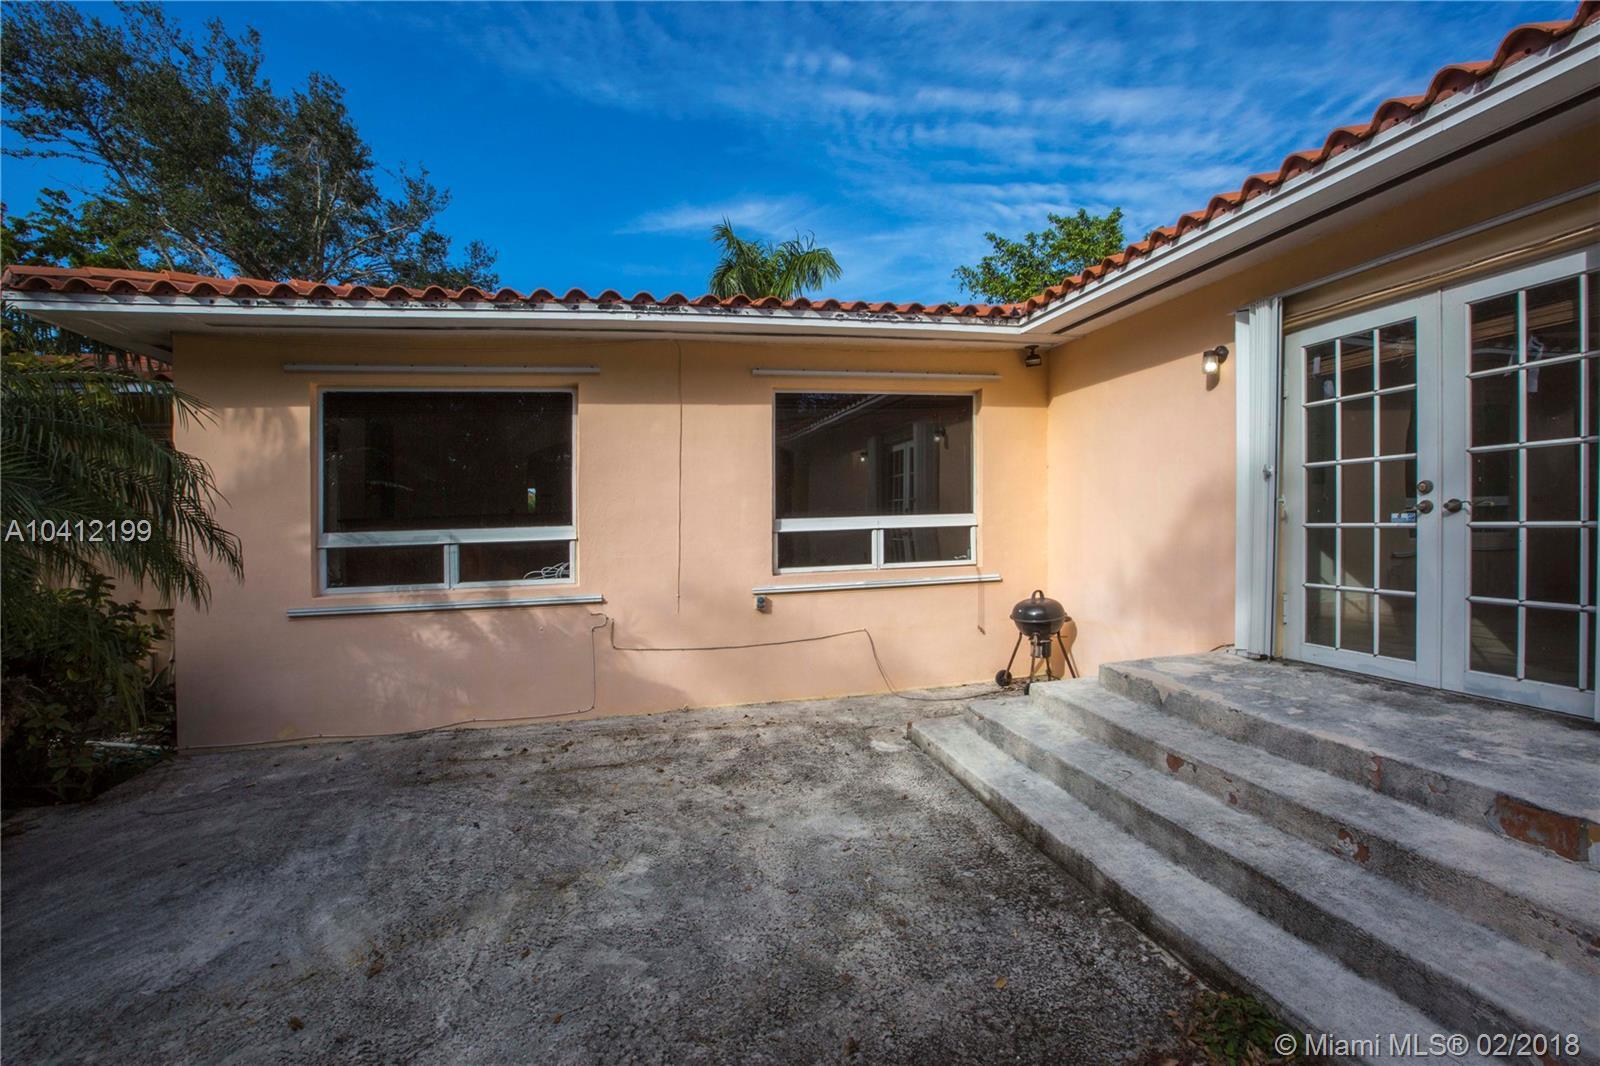 1522 CANTORIA AV, Coral Gables , FL 33146